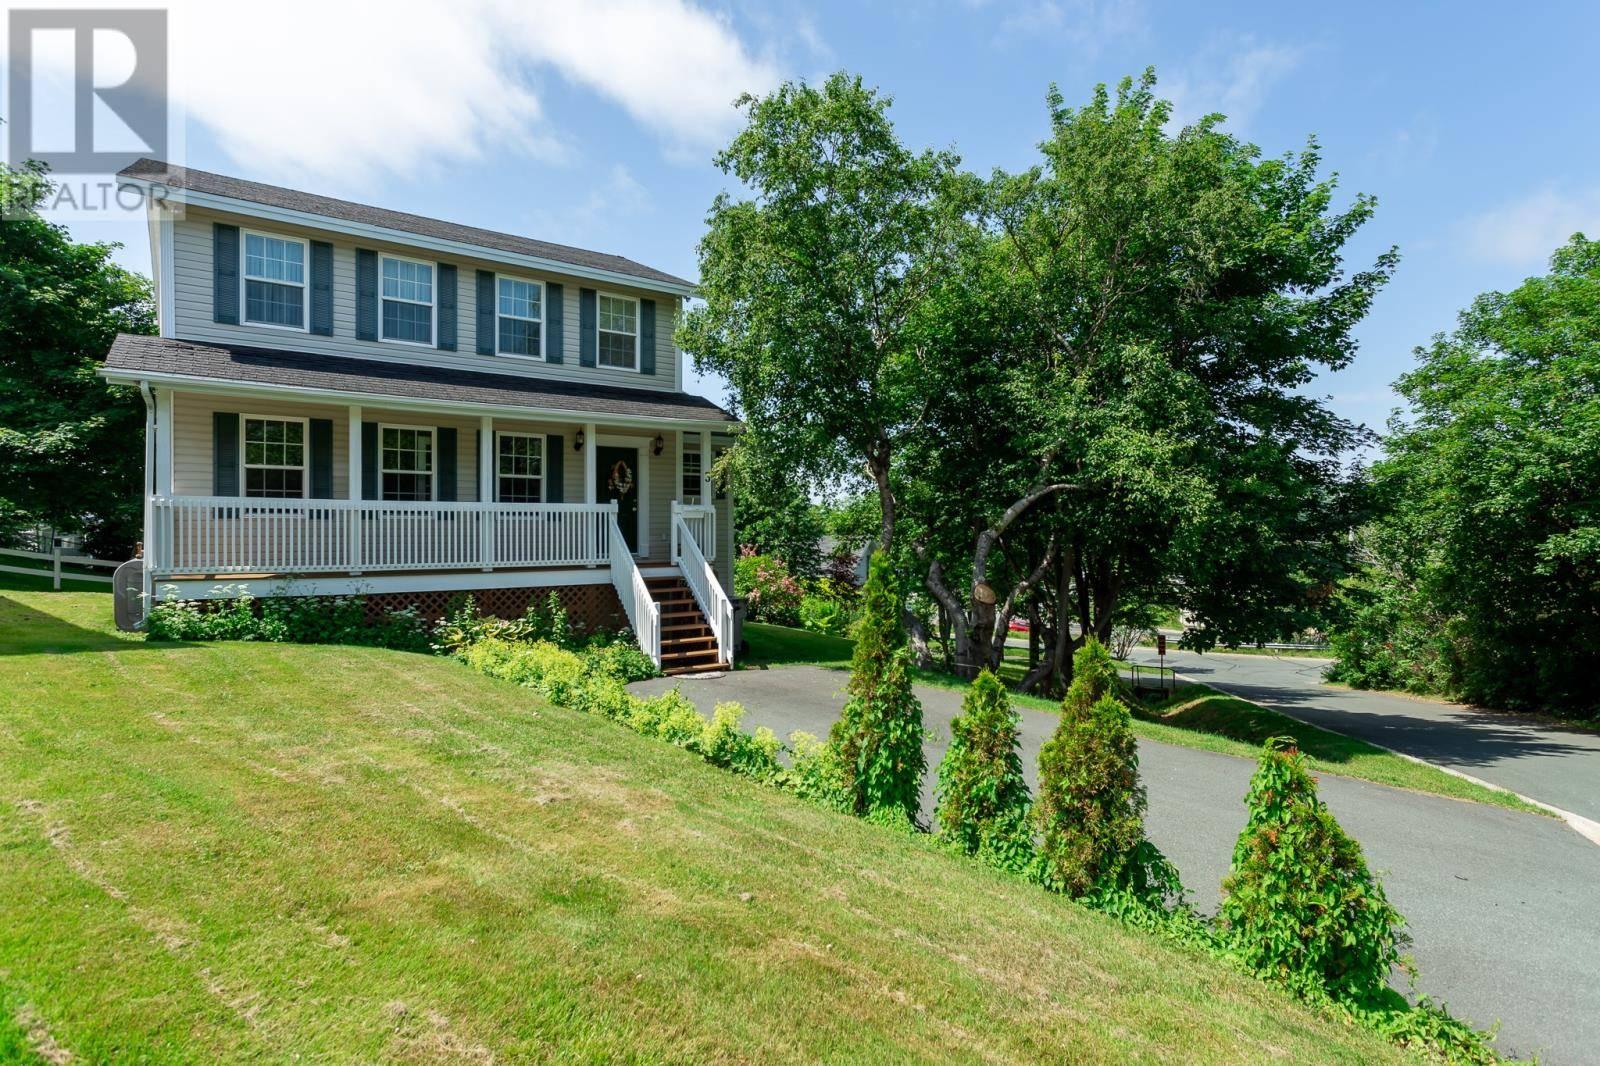 House for sale at 3 Dorseys Ln St. John's Newfoundland - MLS: 1209268